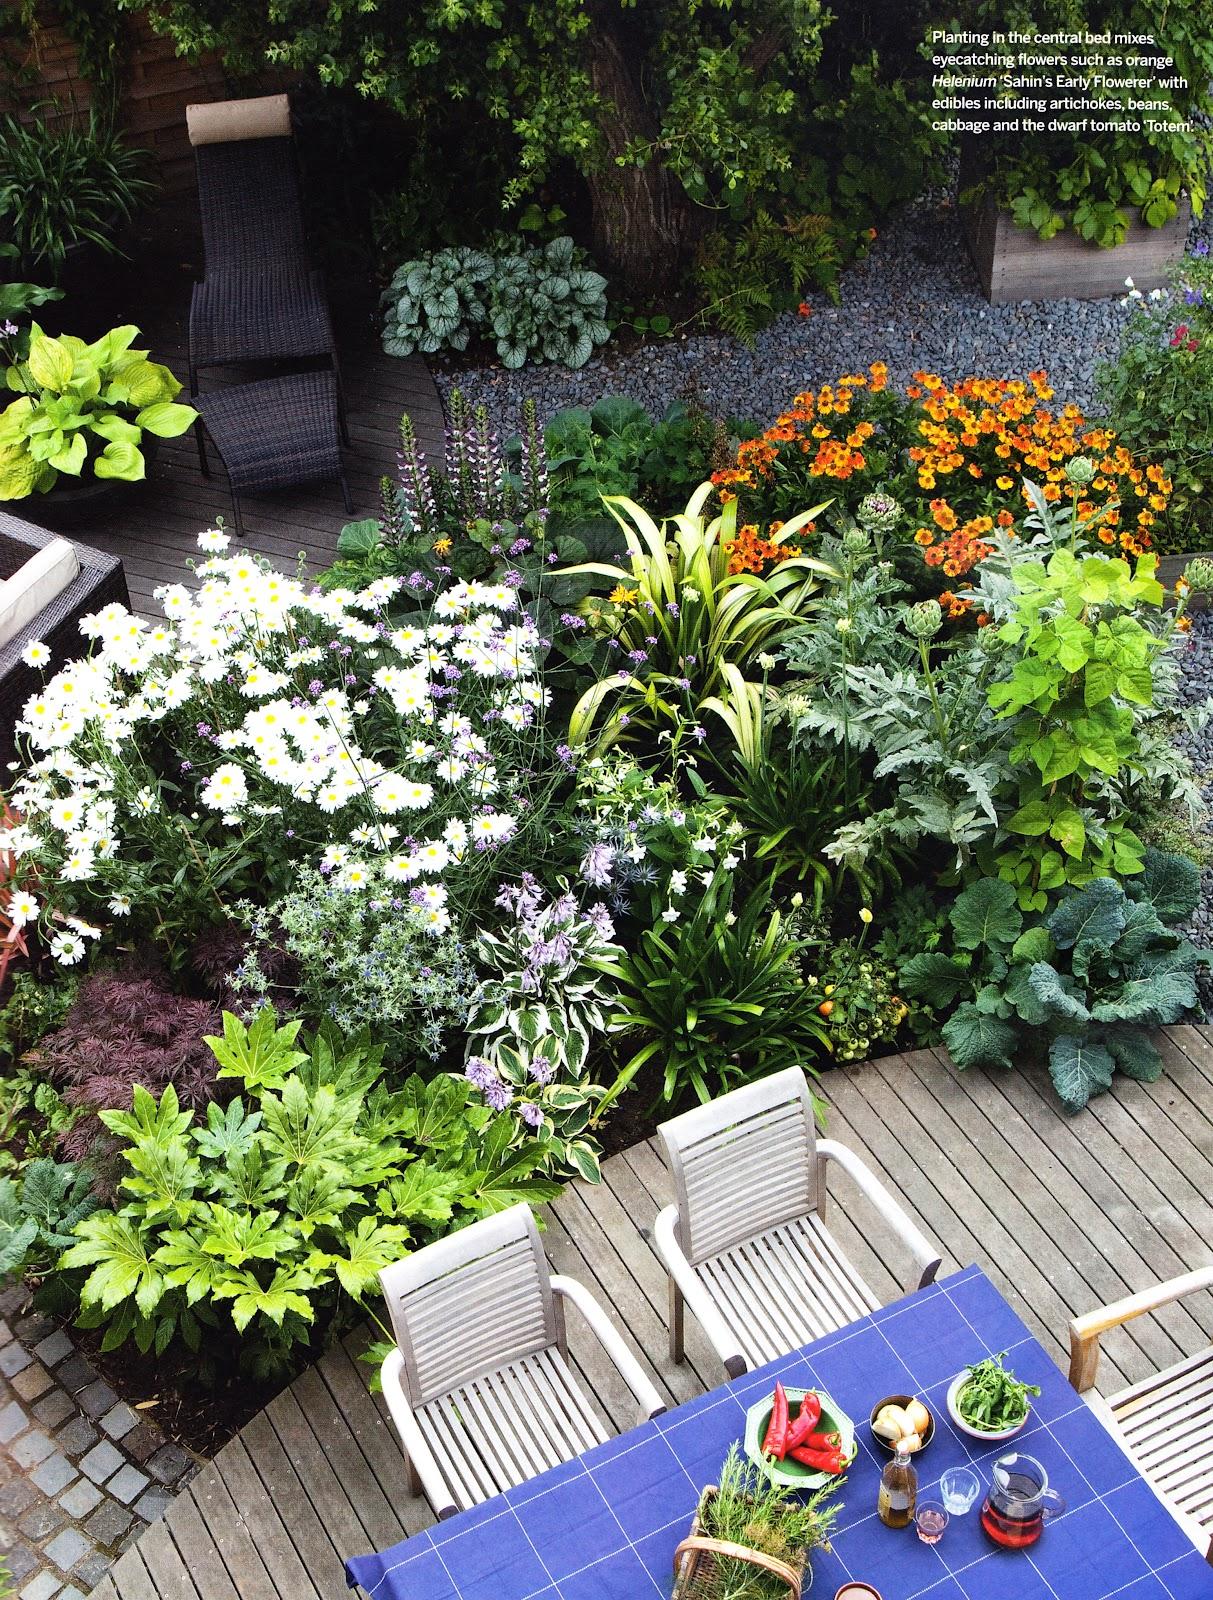 Posted by karen wagner garden design at 11:05